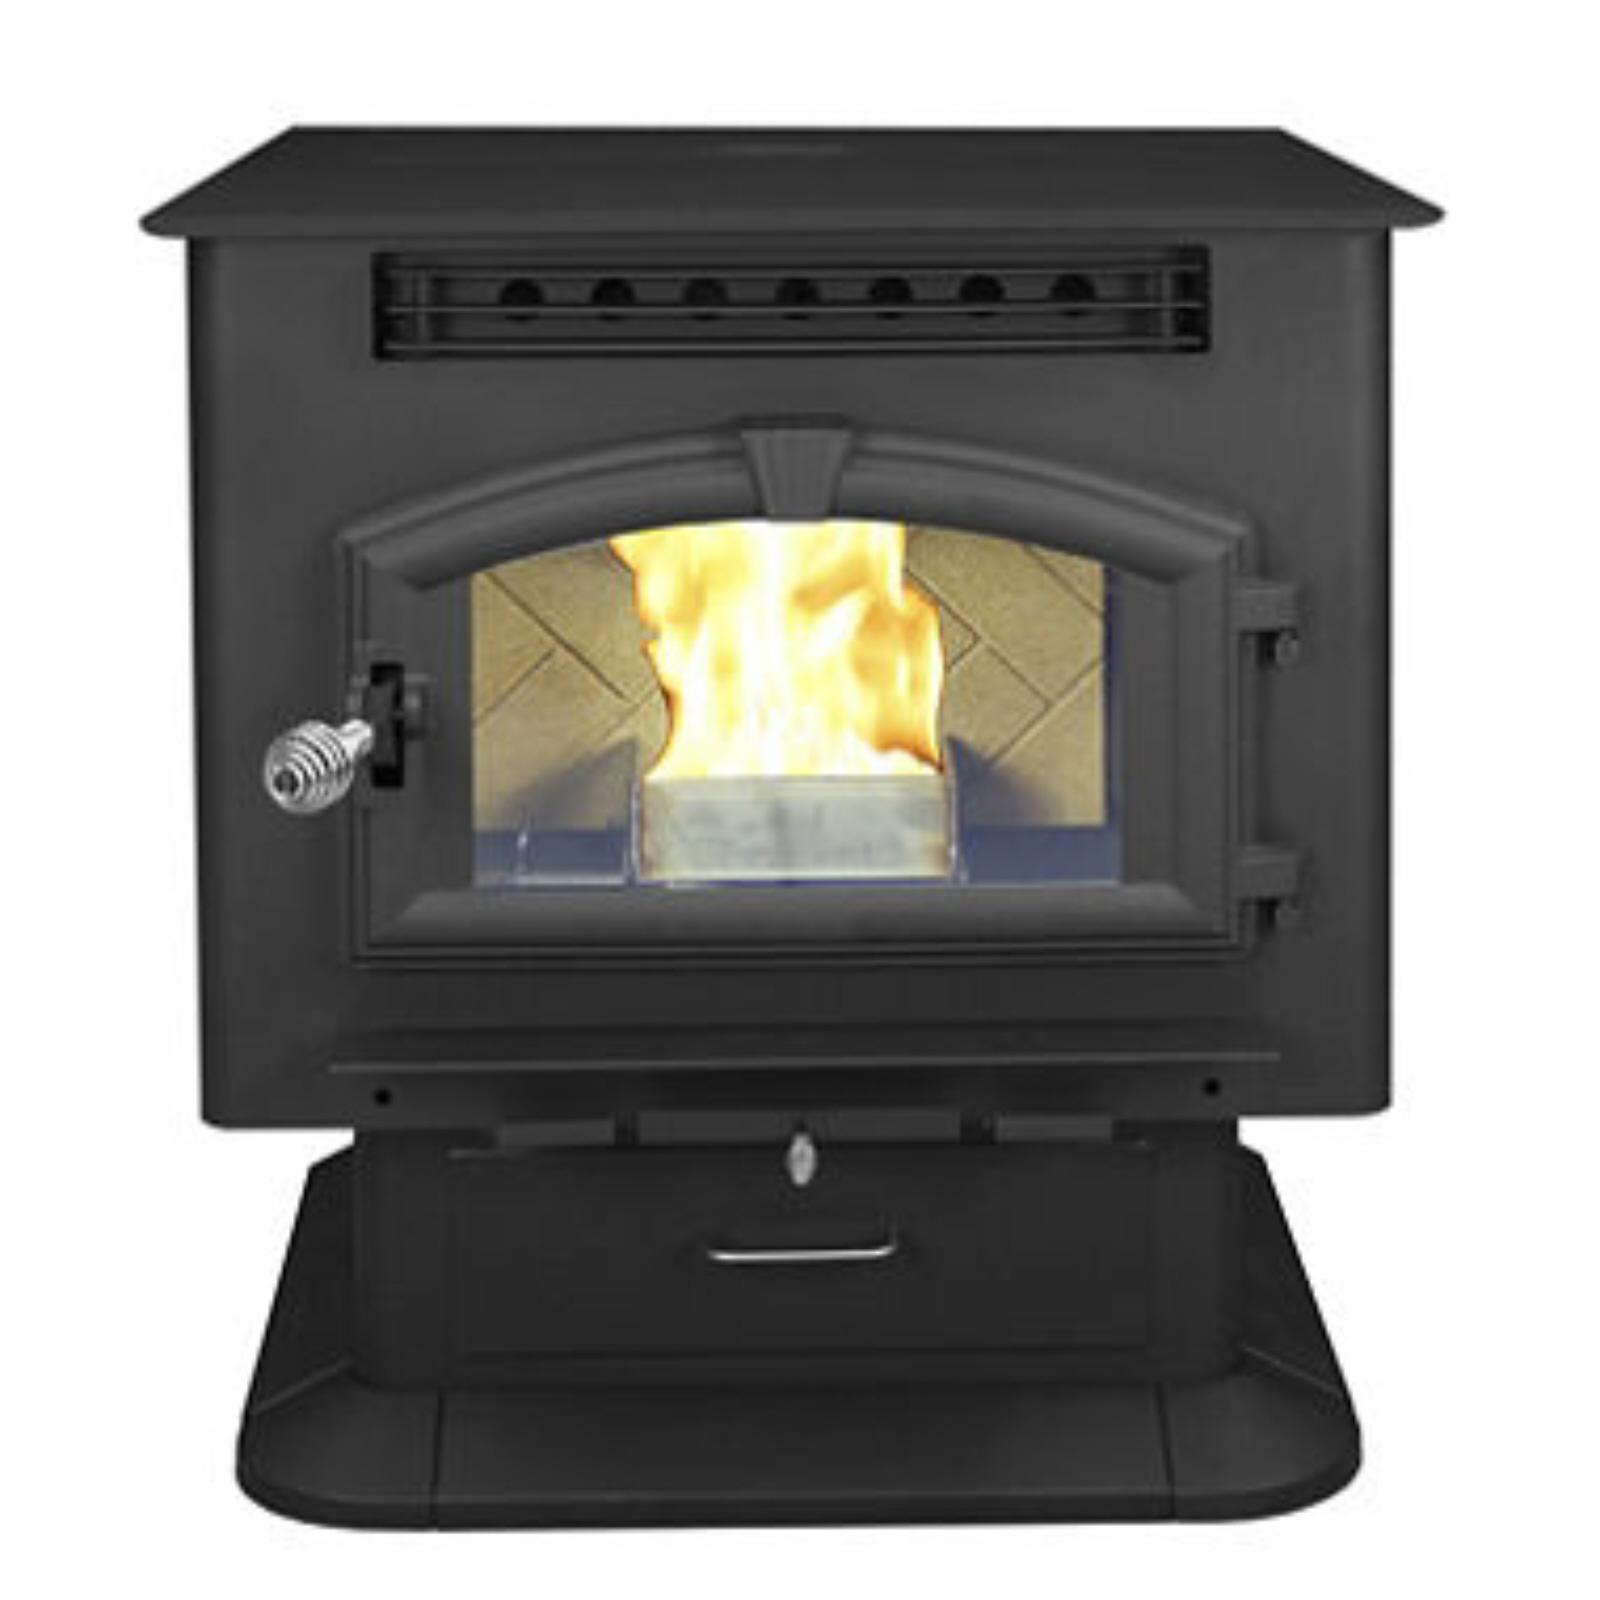 Multifuel Pellet Stove,New,Heater,Pellet Furnace,mini ...